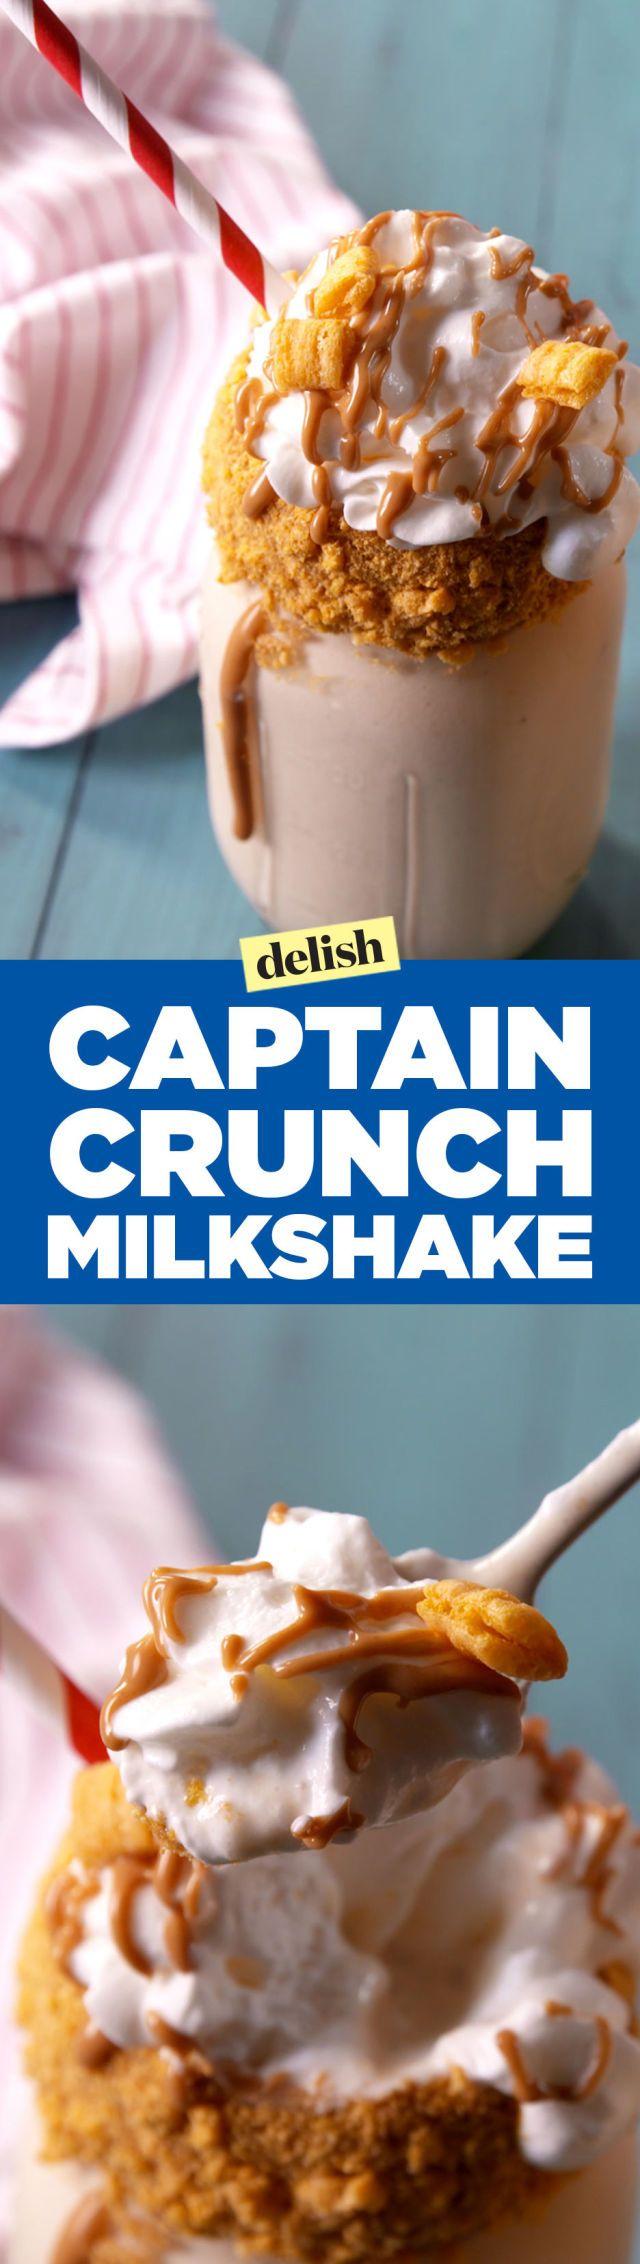 Damn Right, Cap'n Crunch Milkshakes Are the Best In The Yard